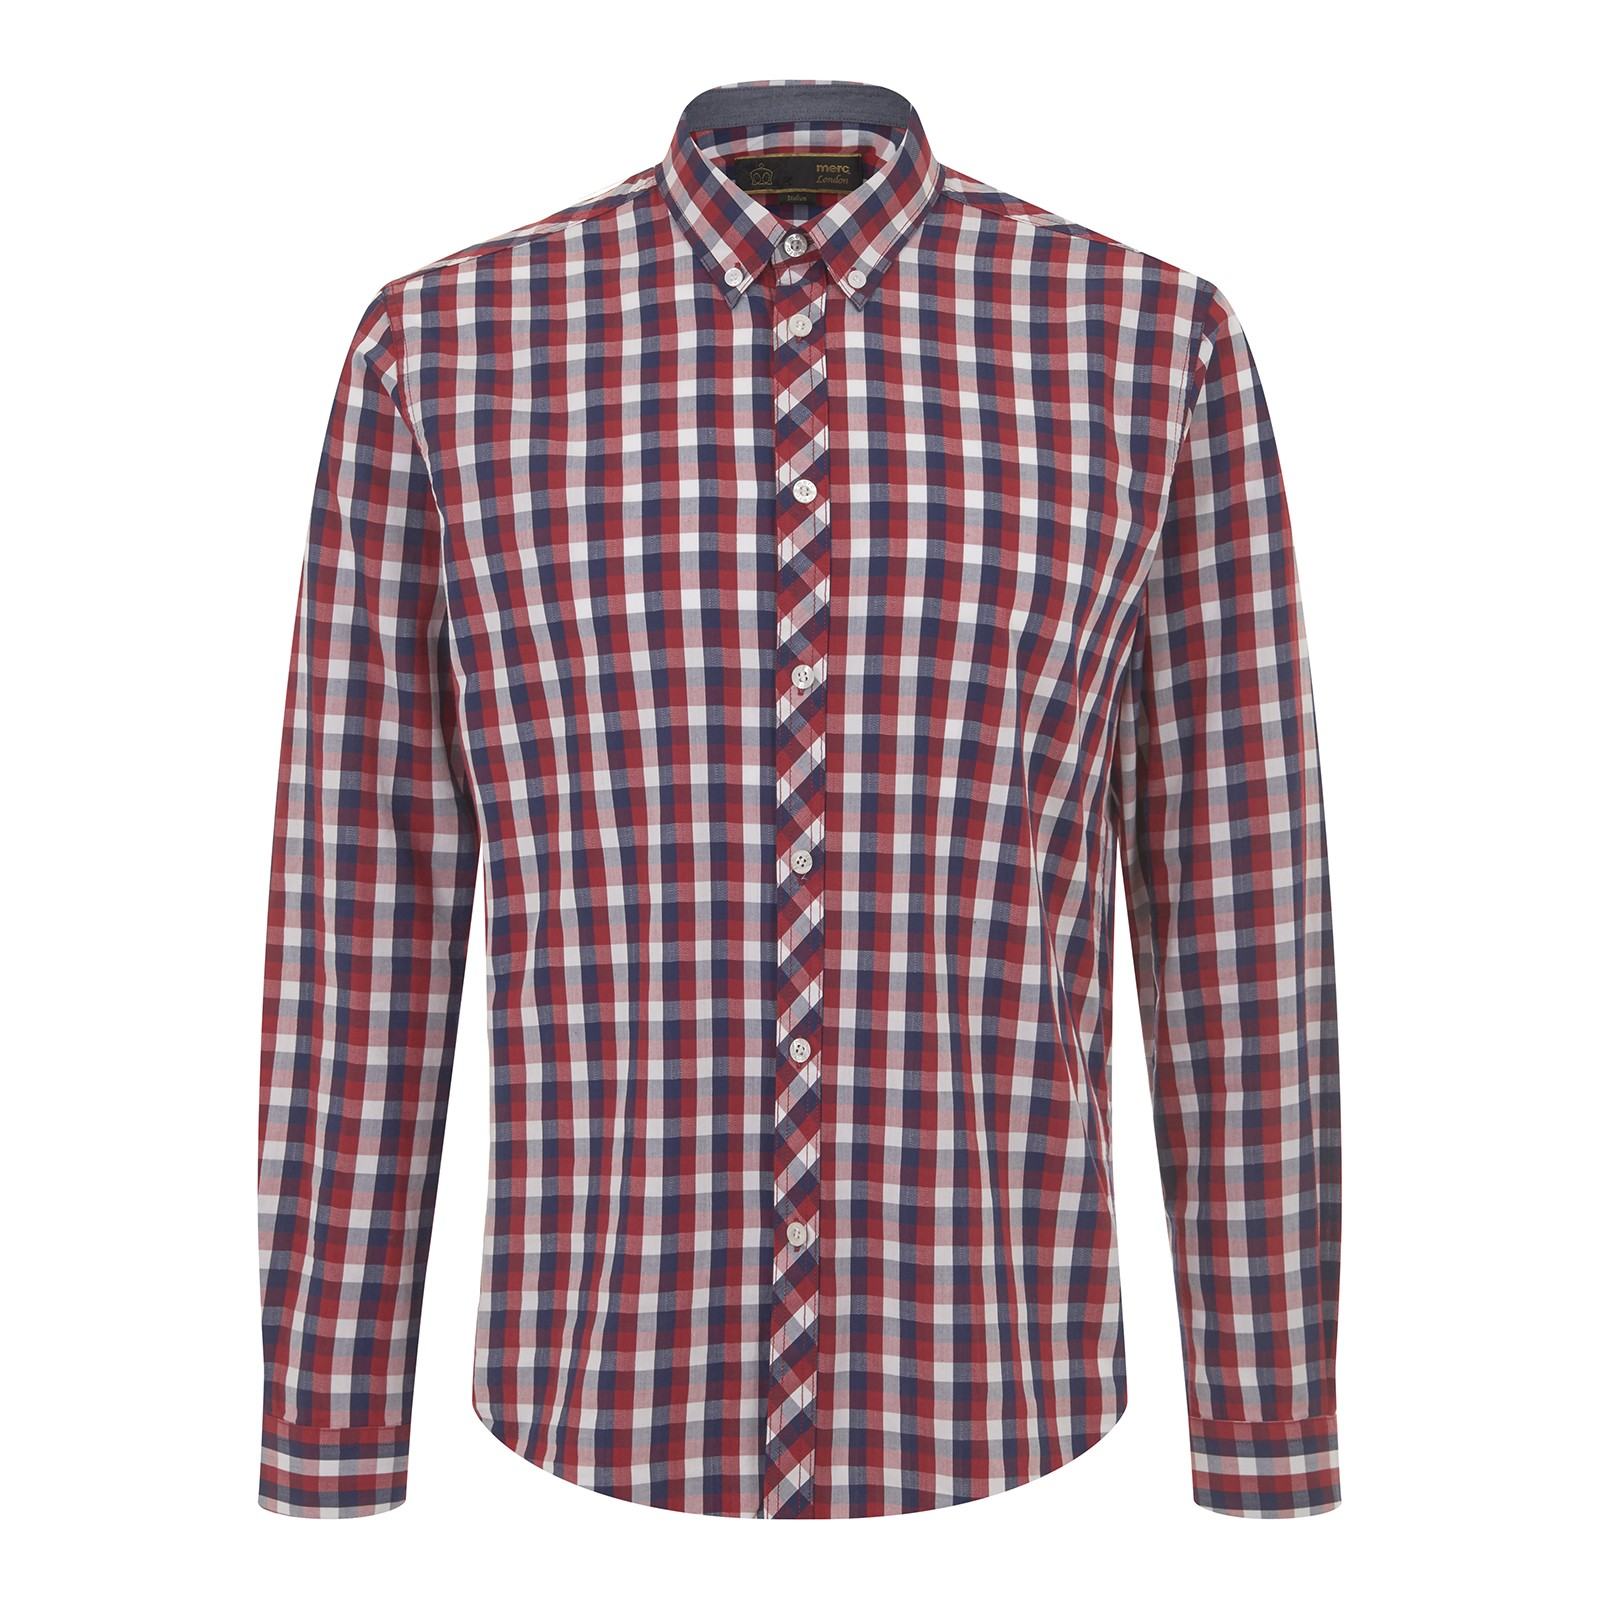 Koszula MERC LONDON ARISTA CHECK SHIRT,  czerwono niebieska